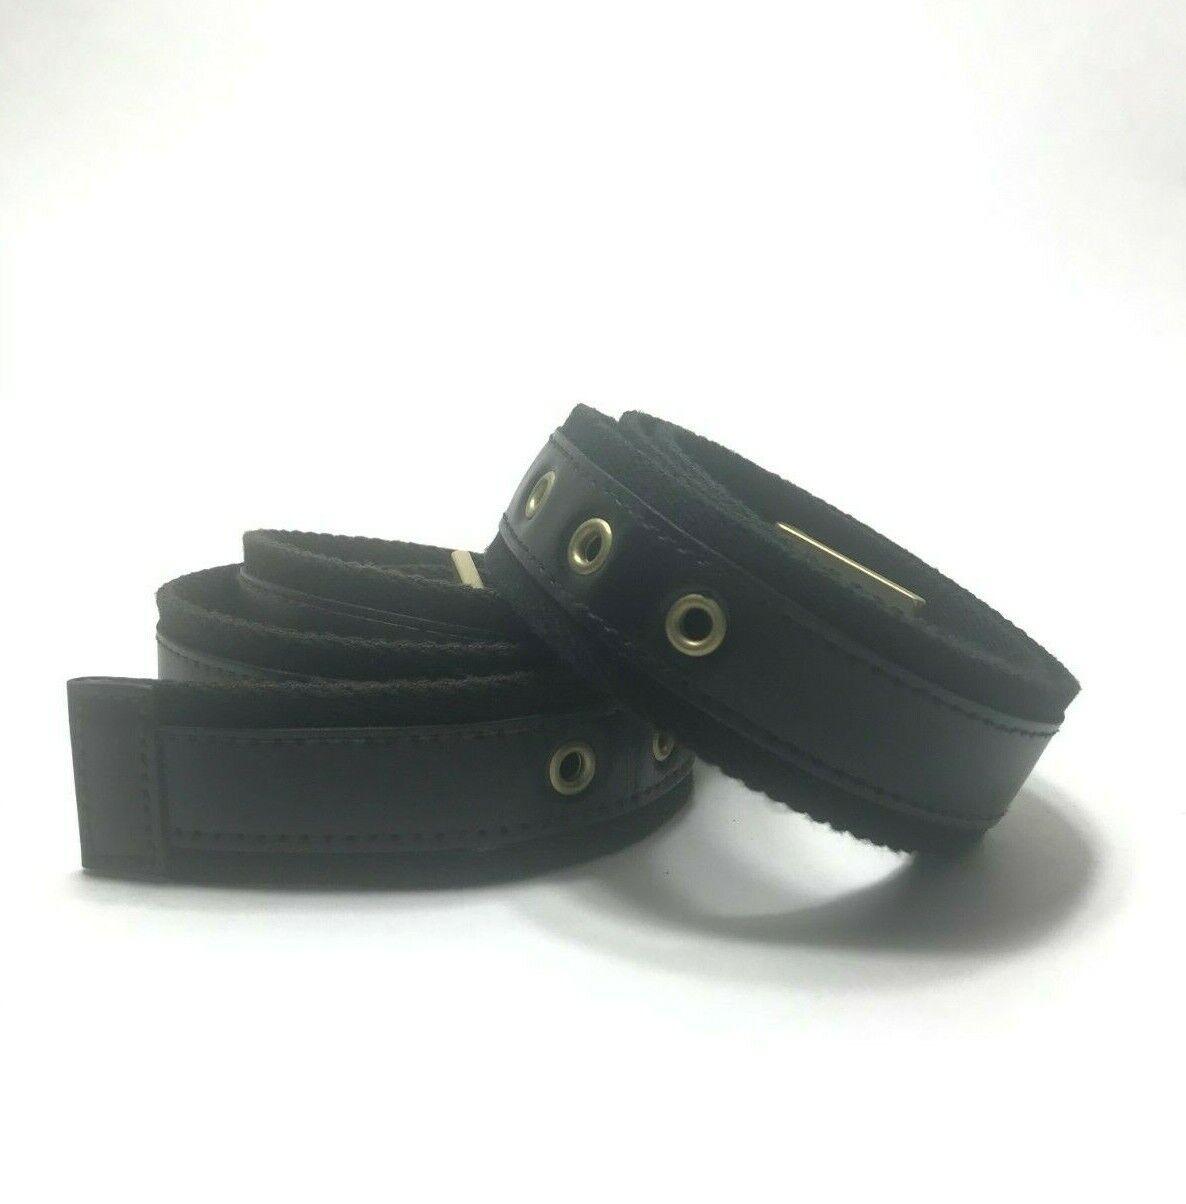 Women's Lot of 2 Brown & Black Canvas Casual Belt Size Medium